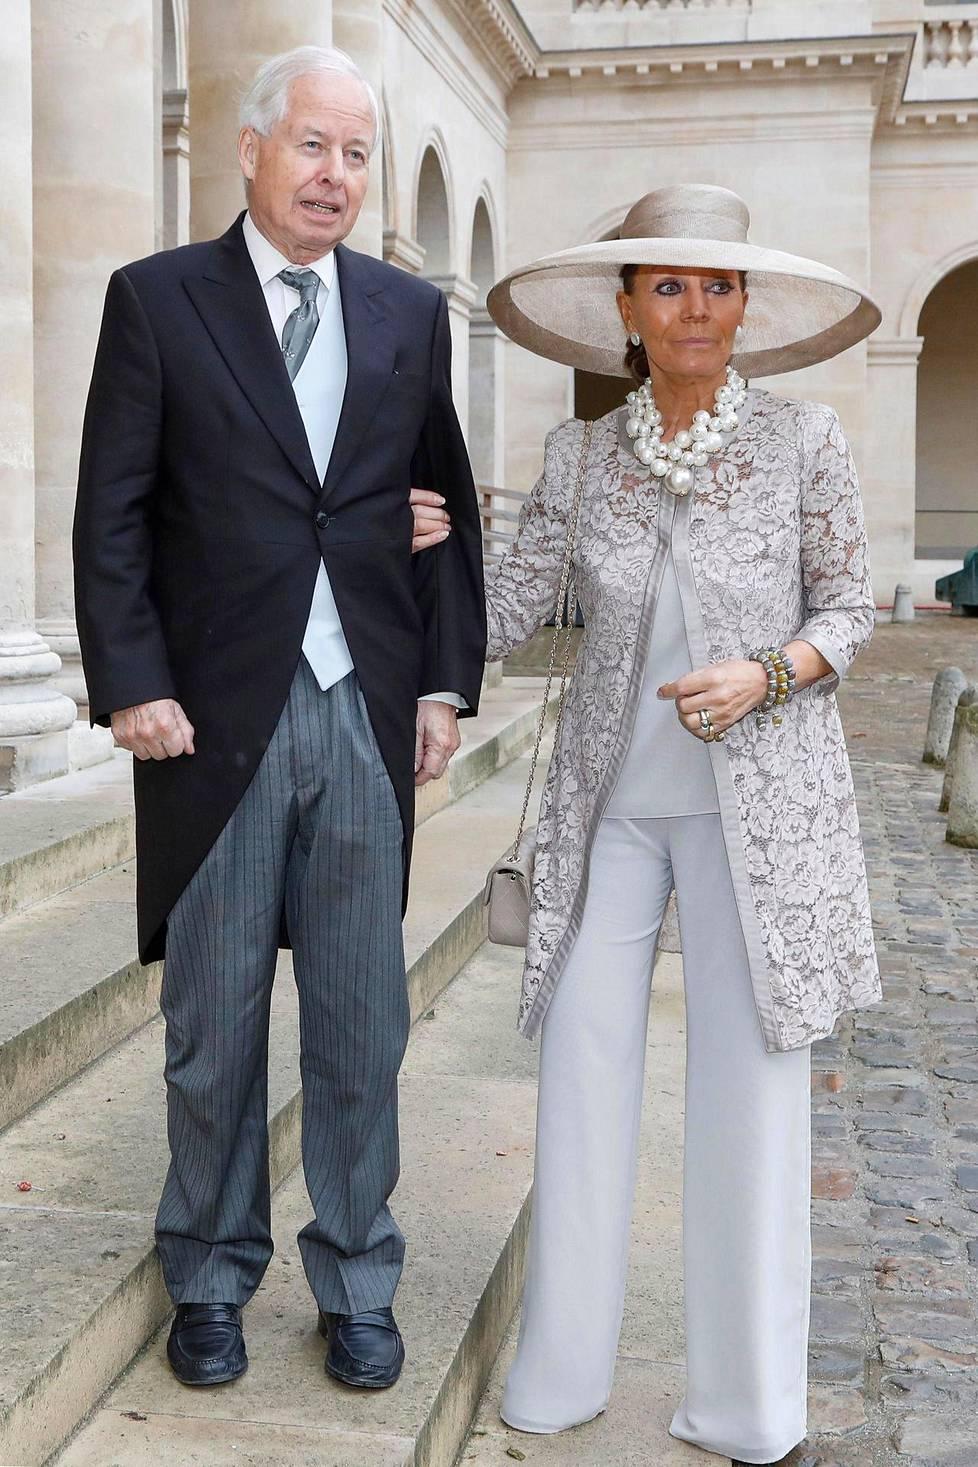 Liechtensteinin prinssi Philipp Erasmus ja hänen vaimonsa prinsessa Isabelle lArbre de Malander.